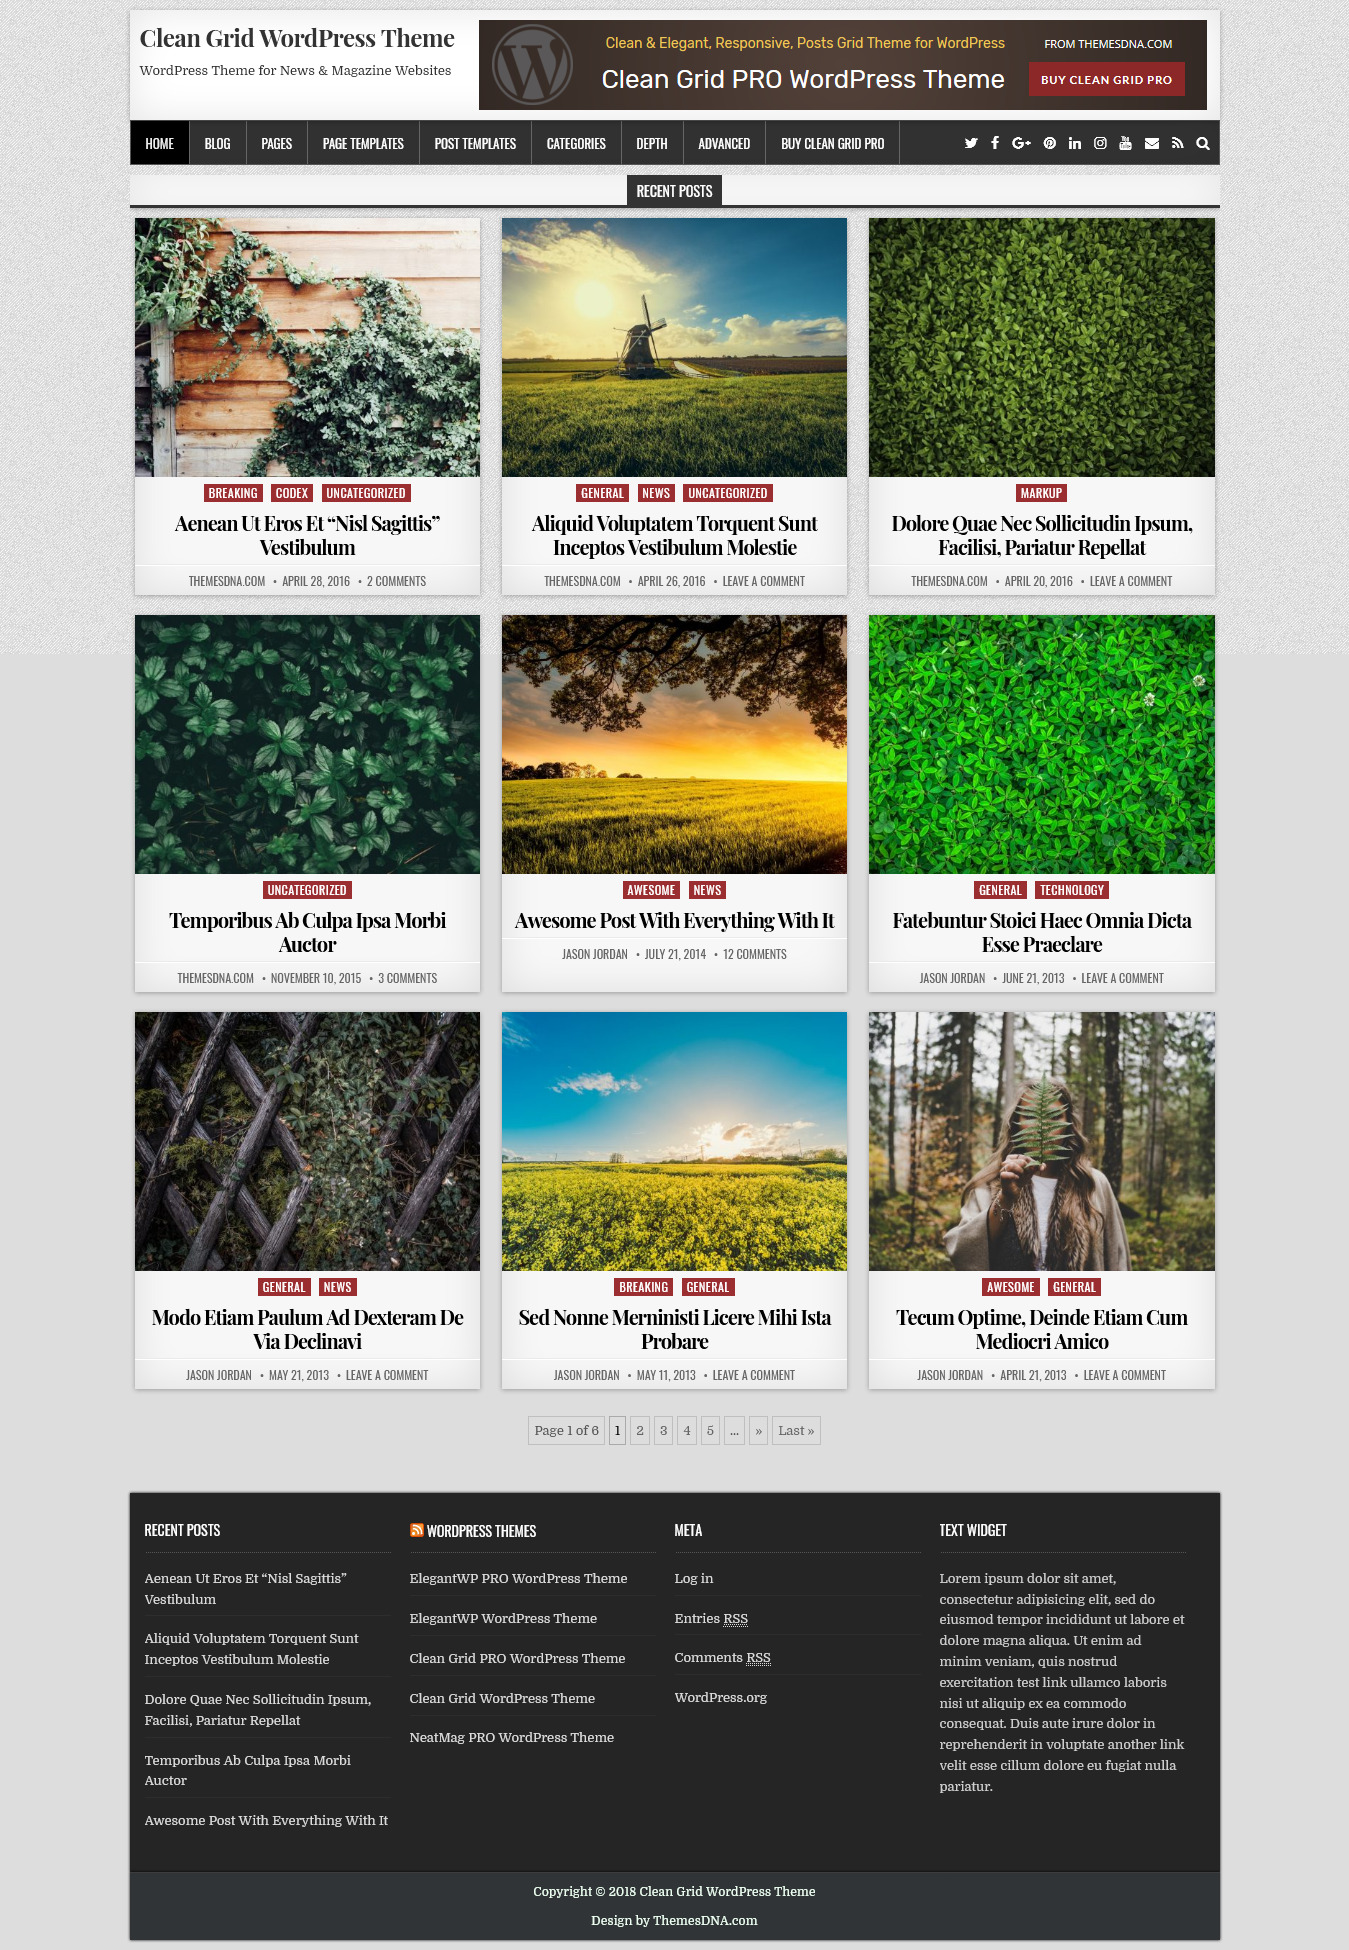 clean grid best free minimal wordpress theme - 10+ Best Free Minimal WordPress Themes